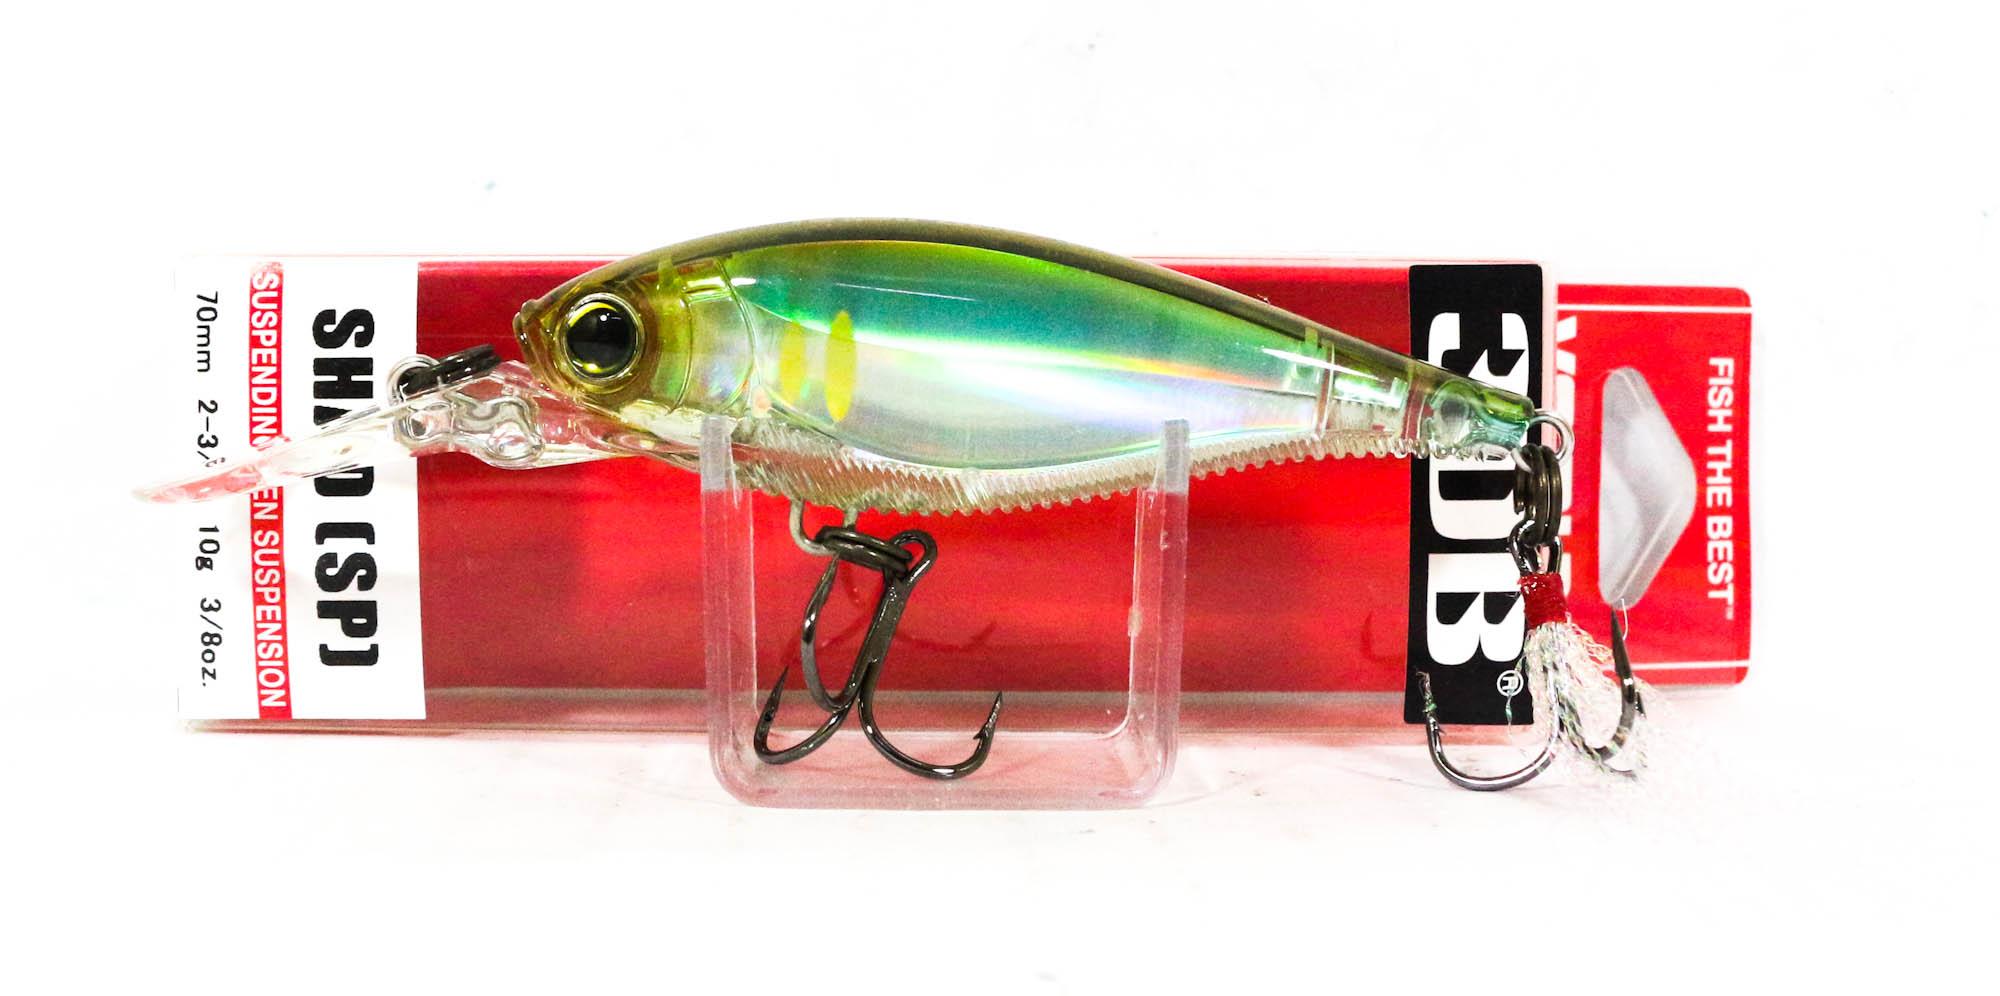 Yo Zuri Duel 3DB Shad 70 mm Suspend Lure R1104-PAY (4610)